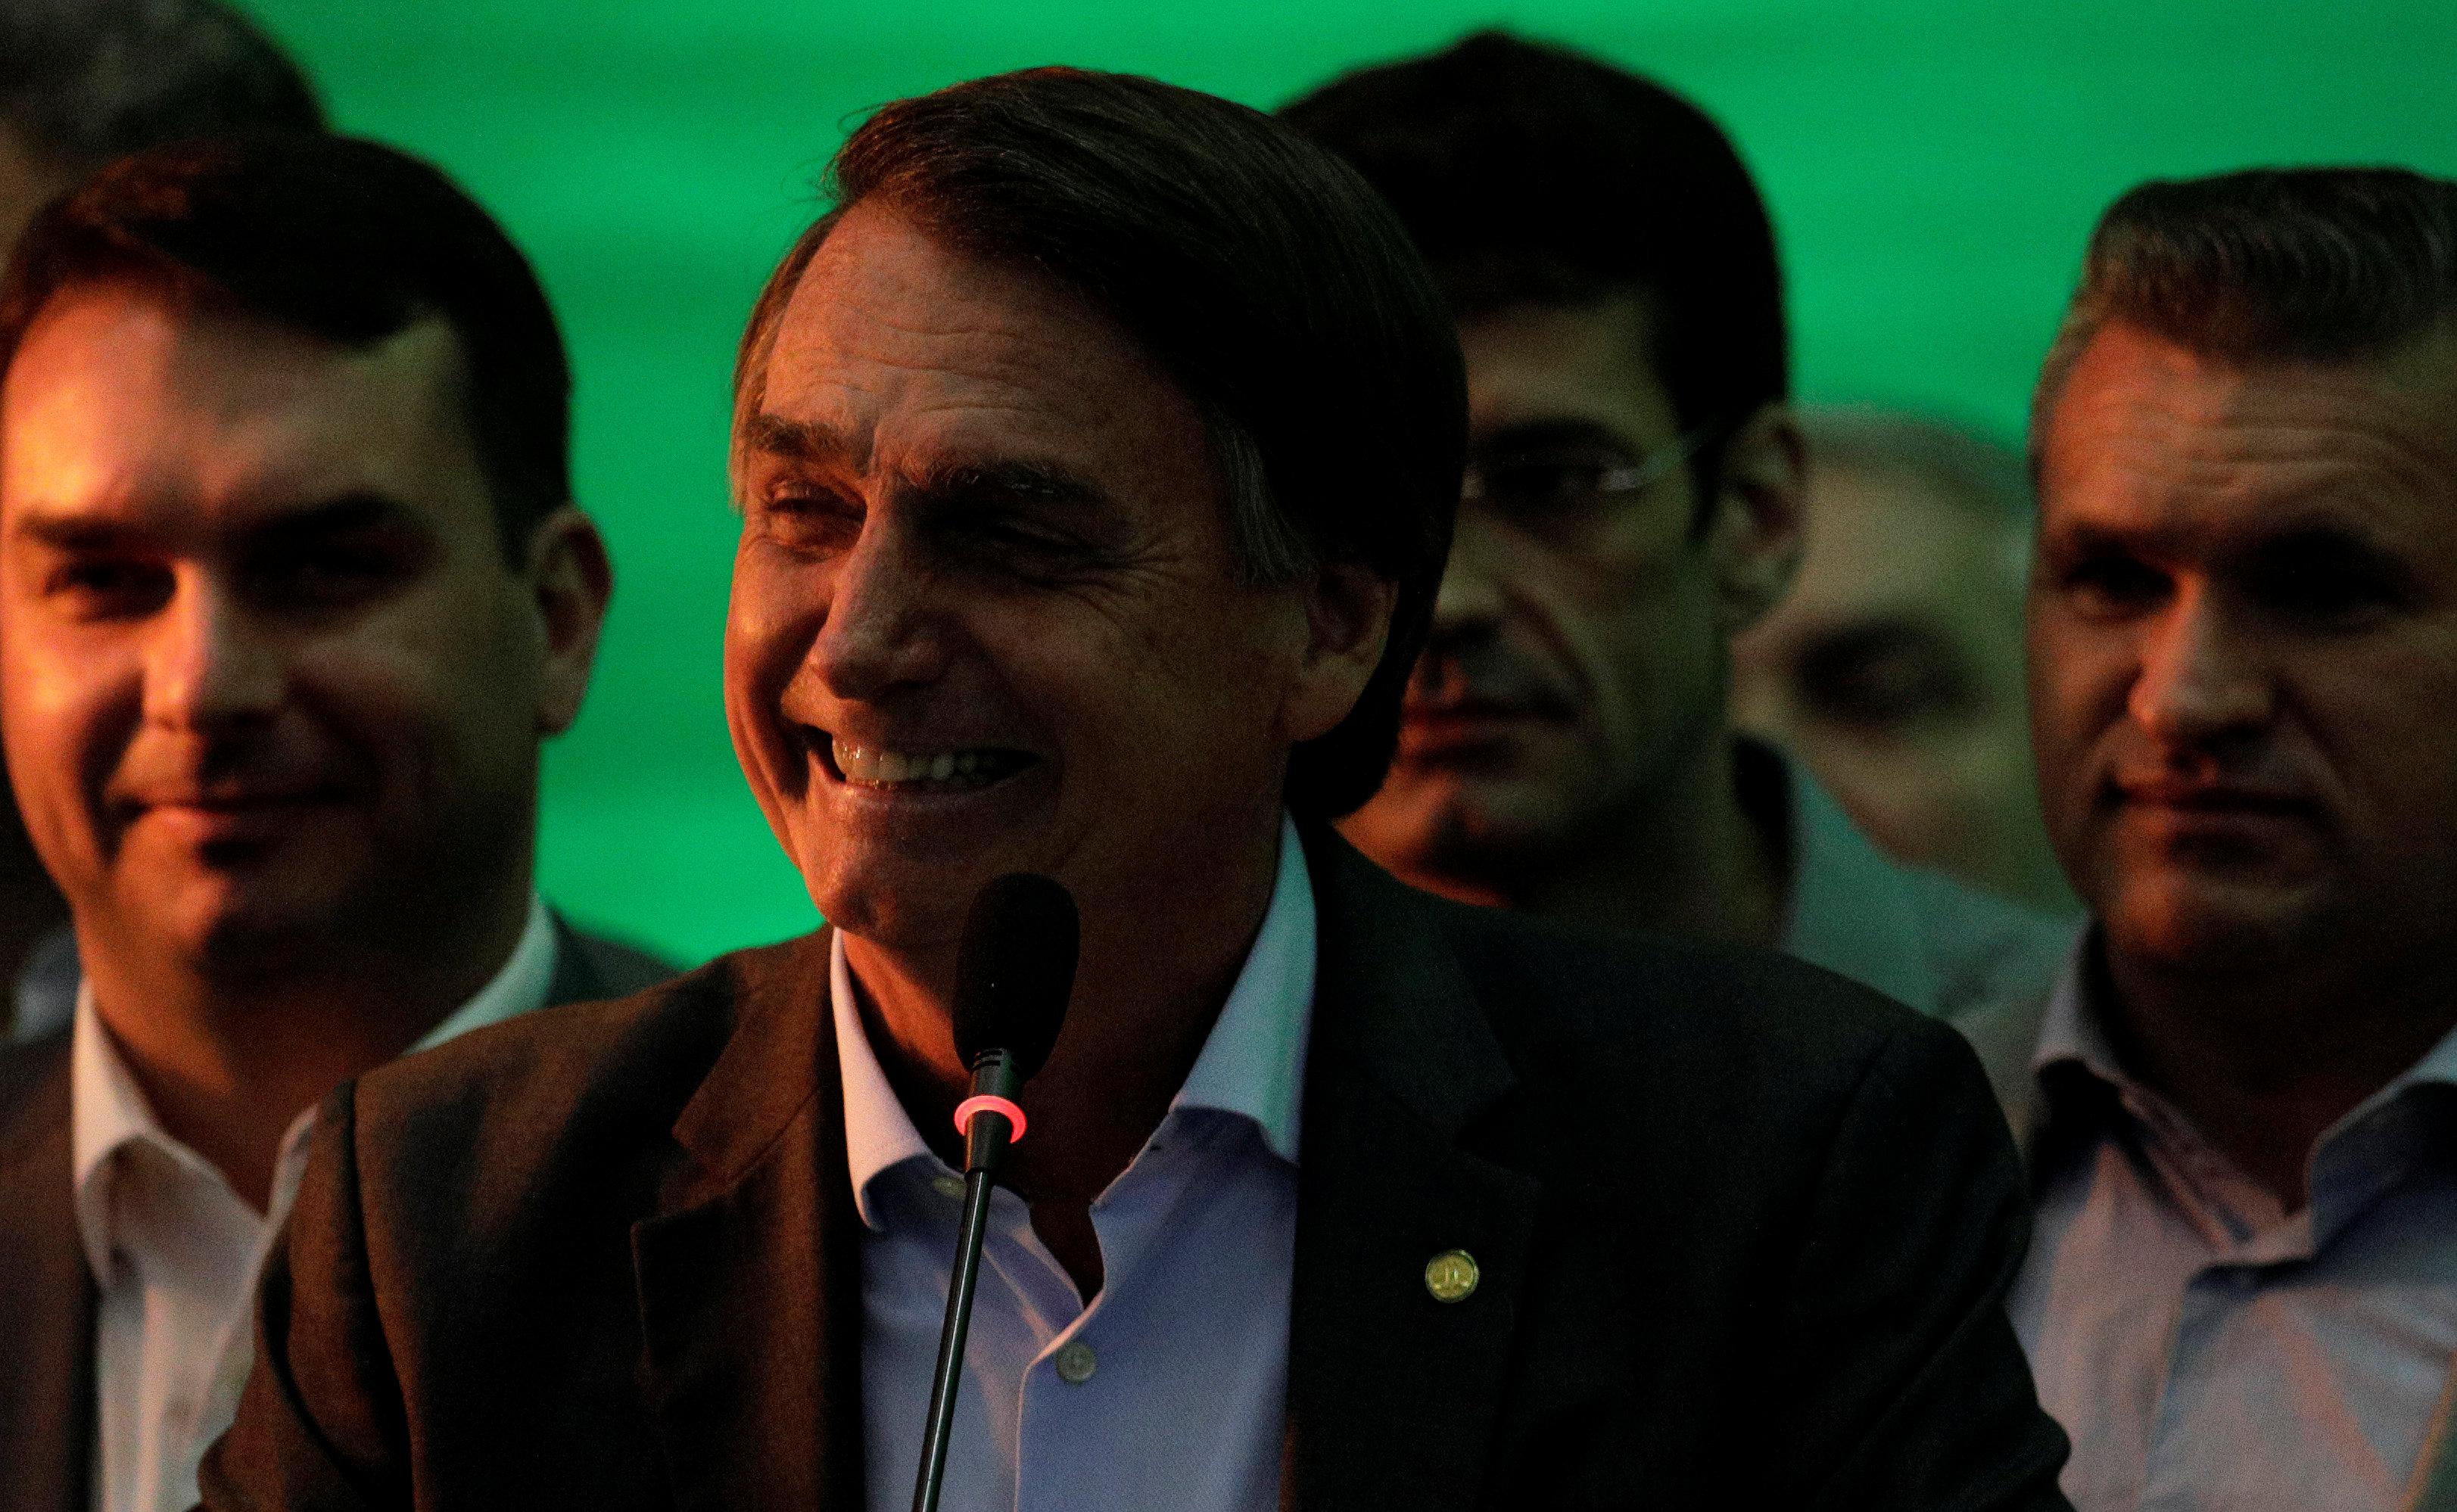 Brazilian right-wing candidate Bolsonaro picks army general as running mate